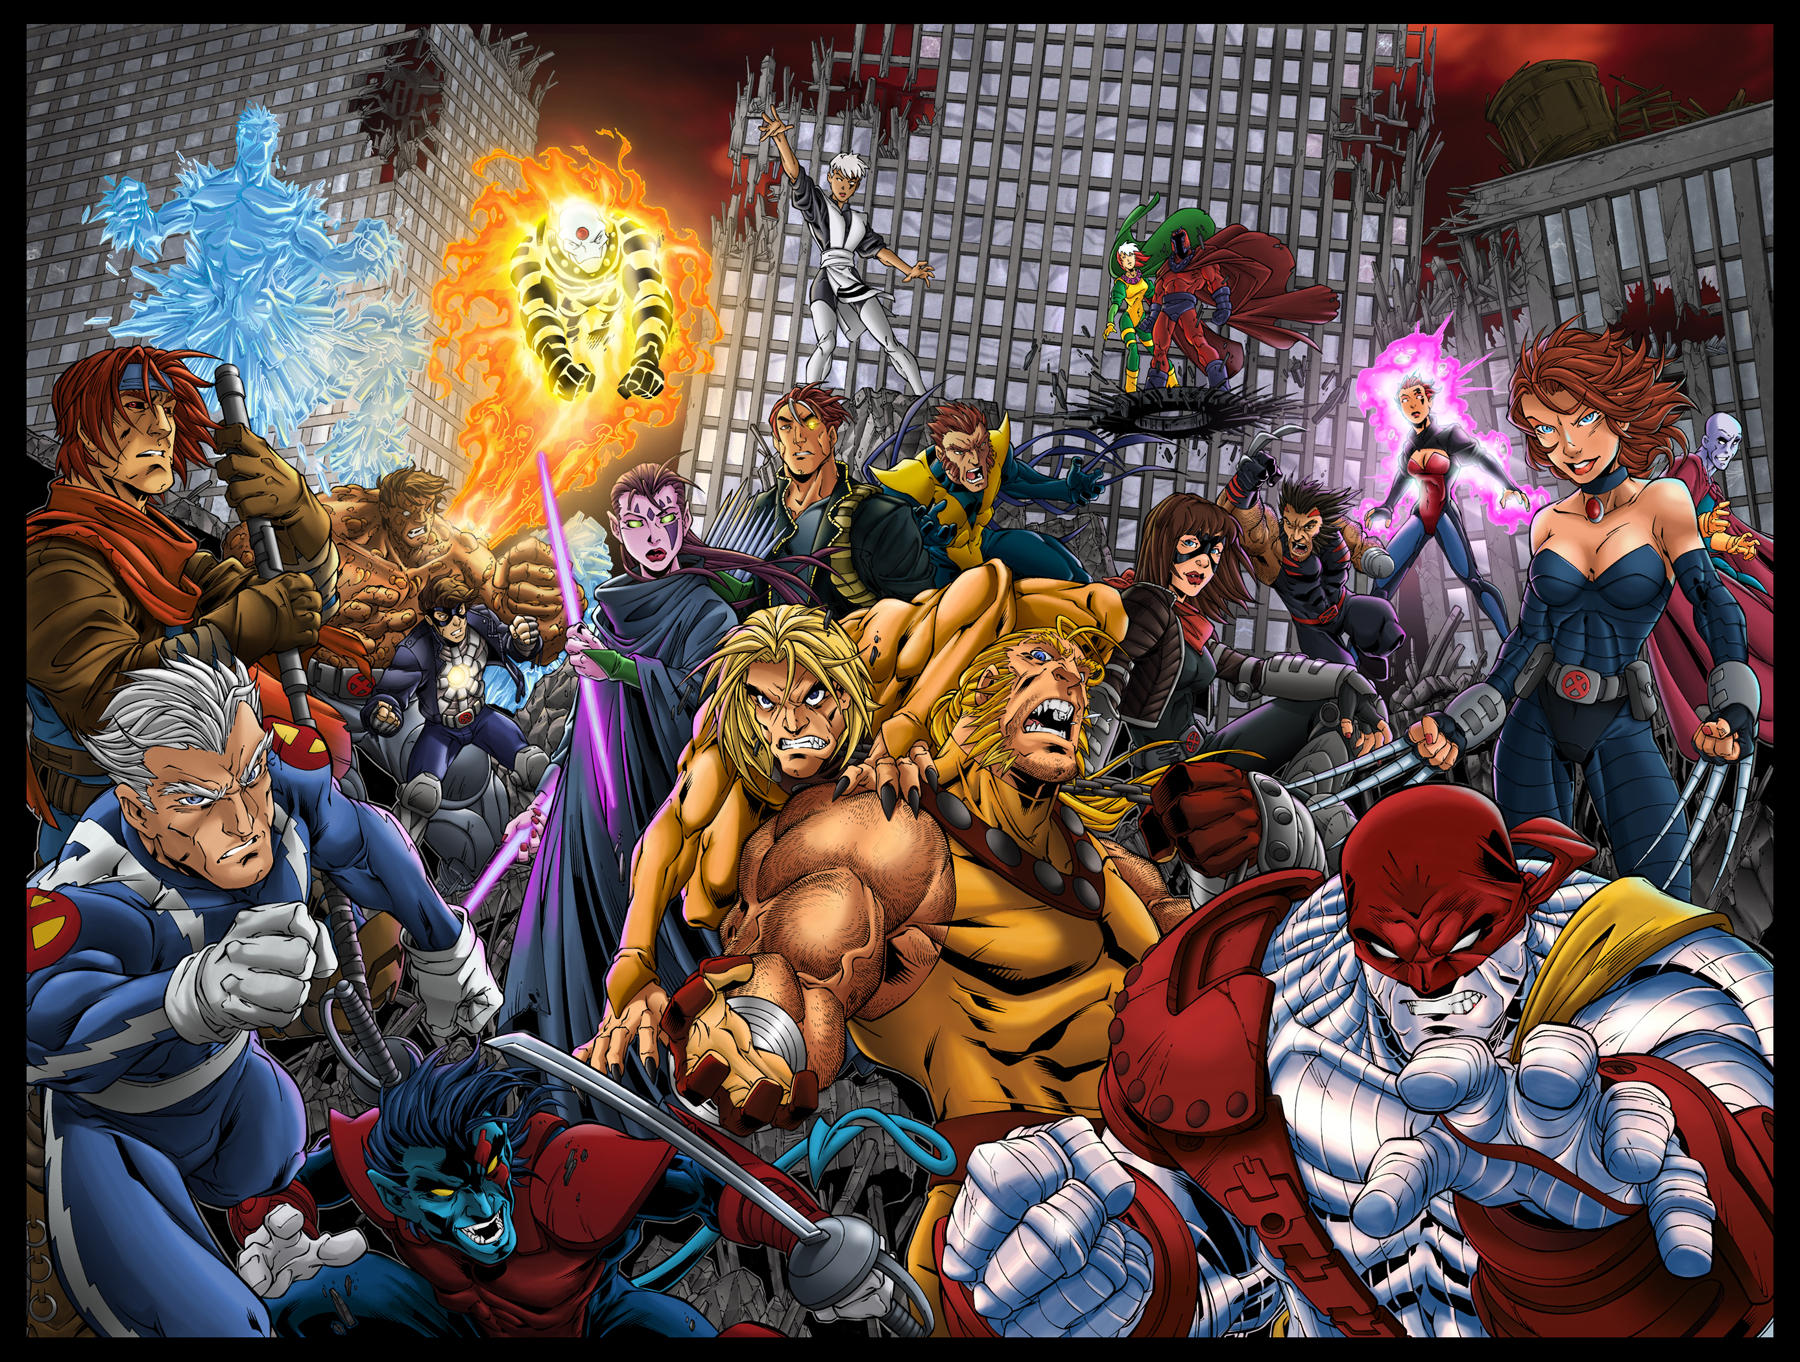 http://fc01.deviantart.net/fs10/i/2006/125/3/9/Age_of_Apocalypse___Contest_by_thisisanton.jpg